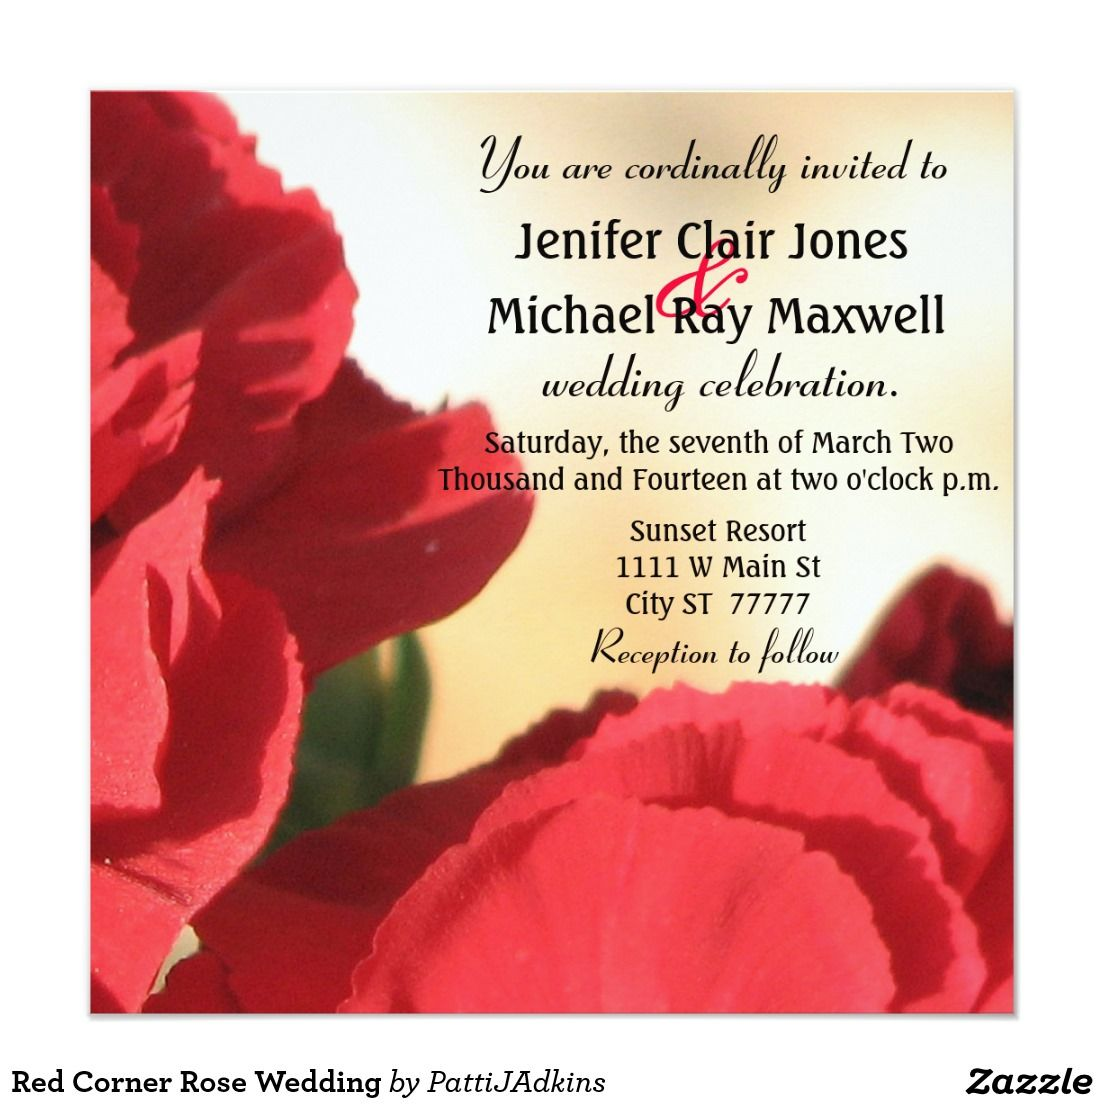 Red Corner Rose Wedding Invitation | Pinterest | Corner, Wedding and ...